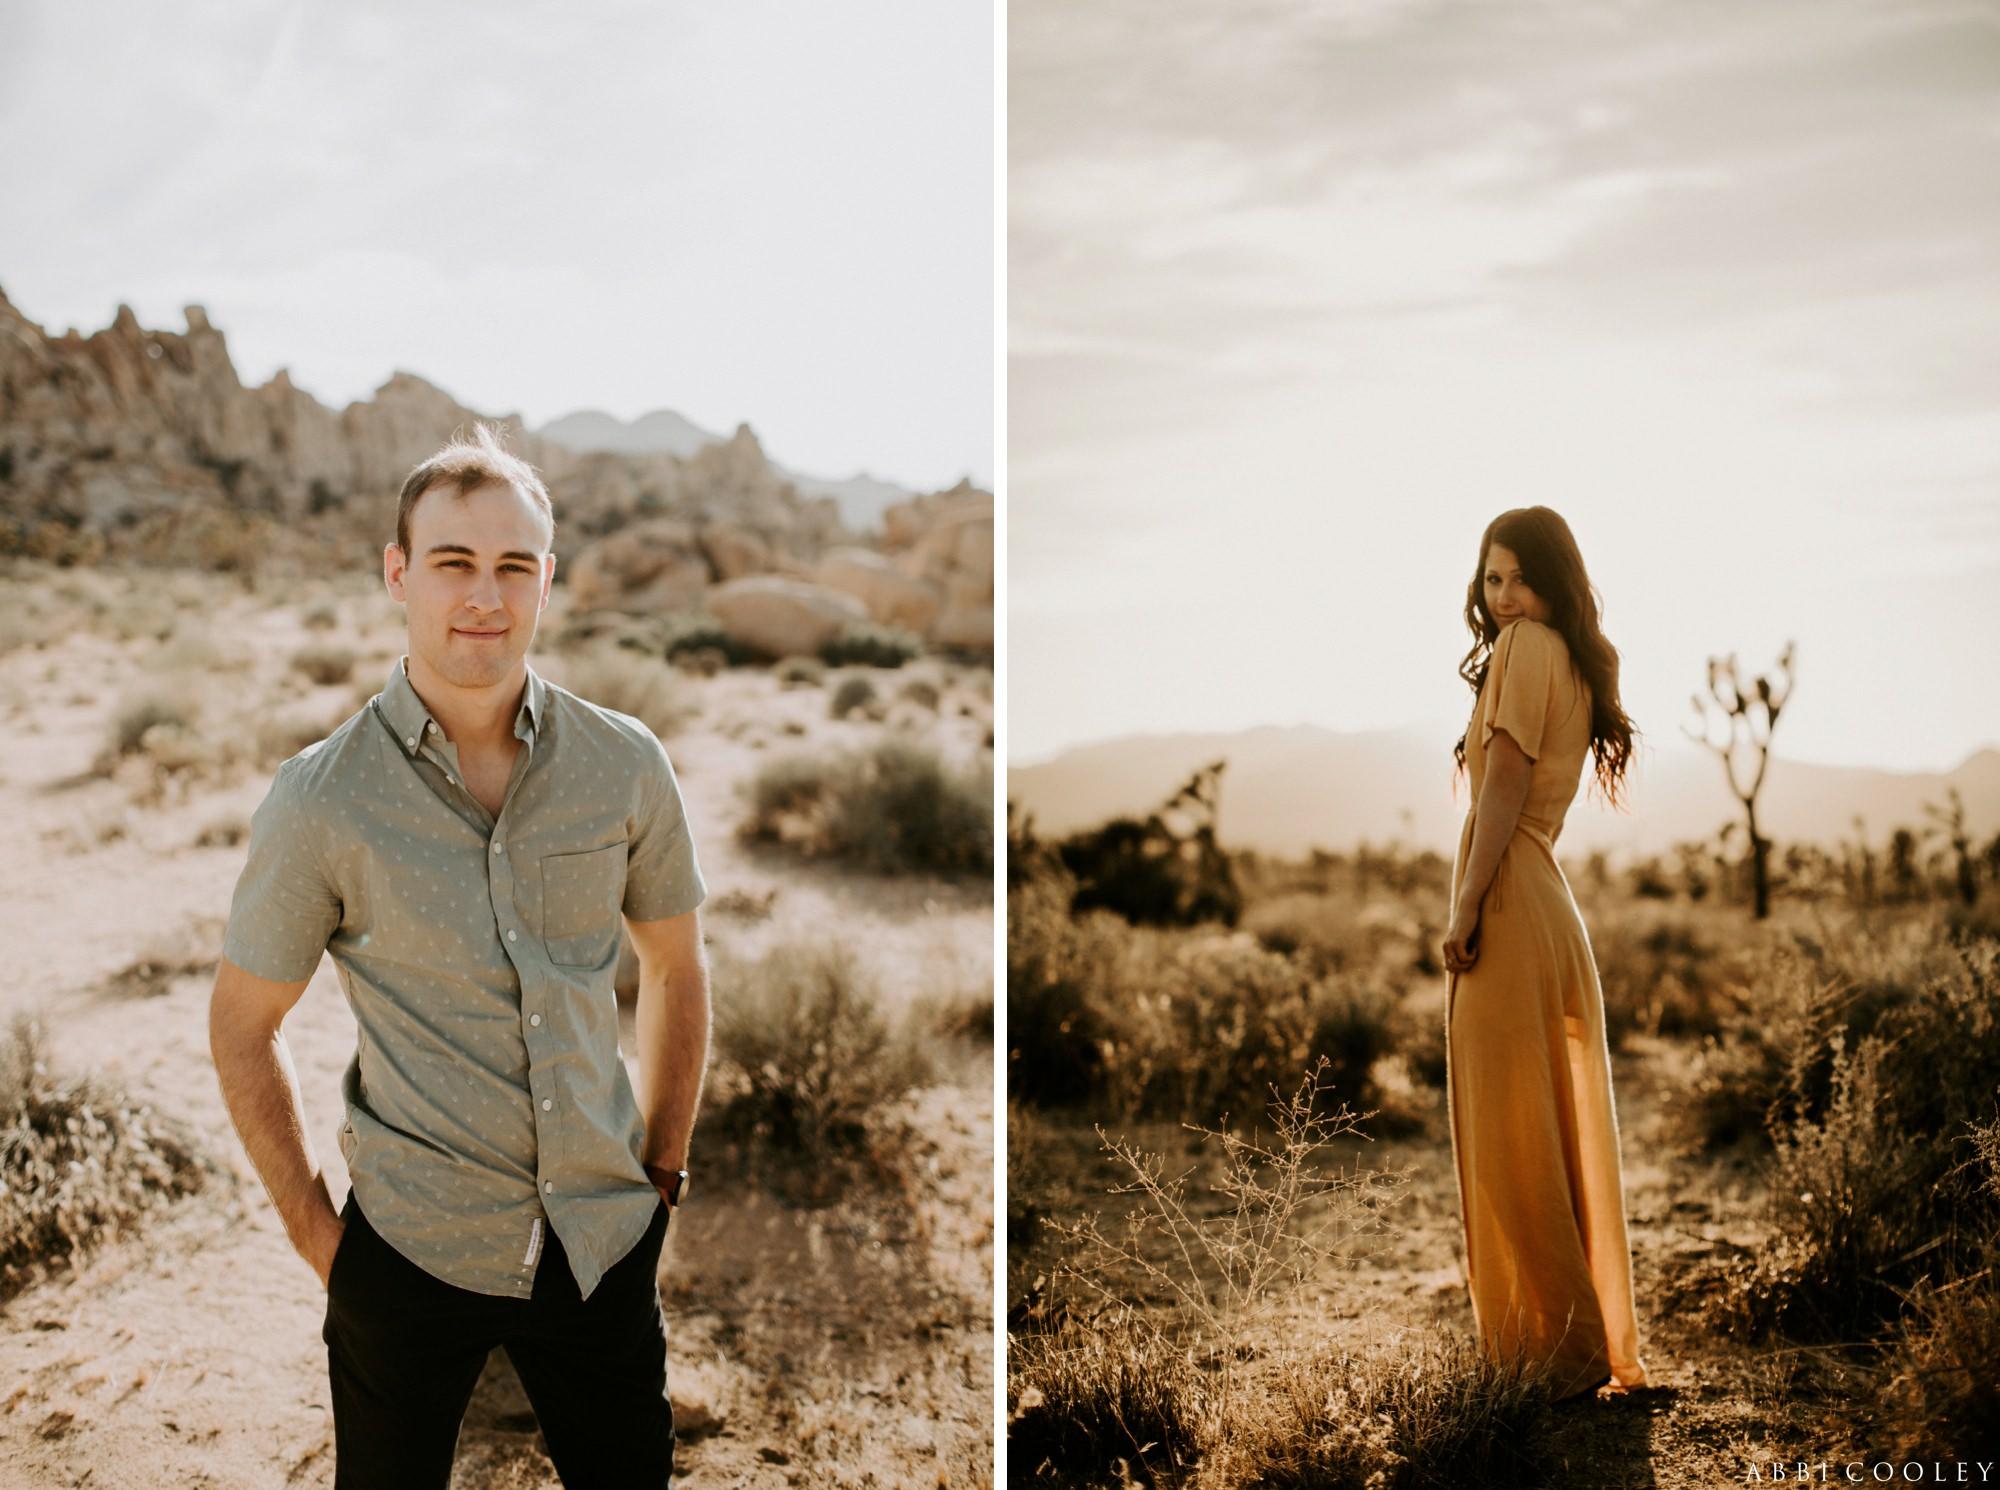 engagement shoot outfit ideas Joshua Tree California Engagement || Abbi Cooley